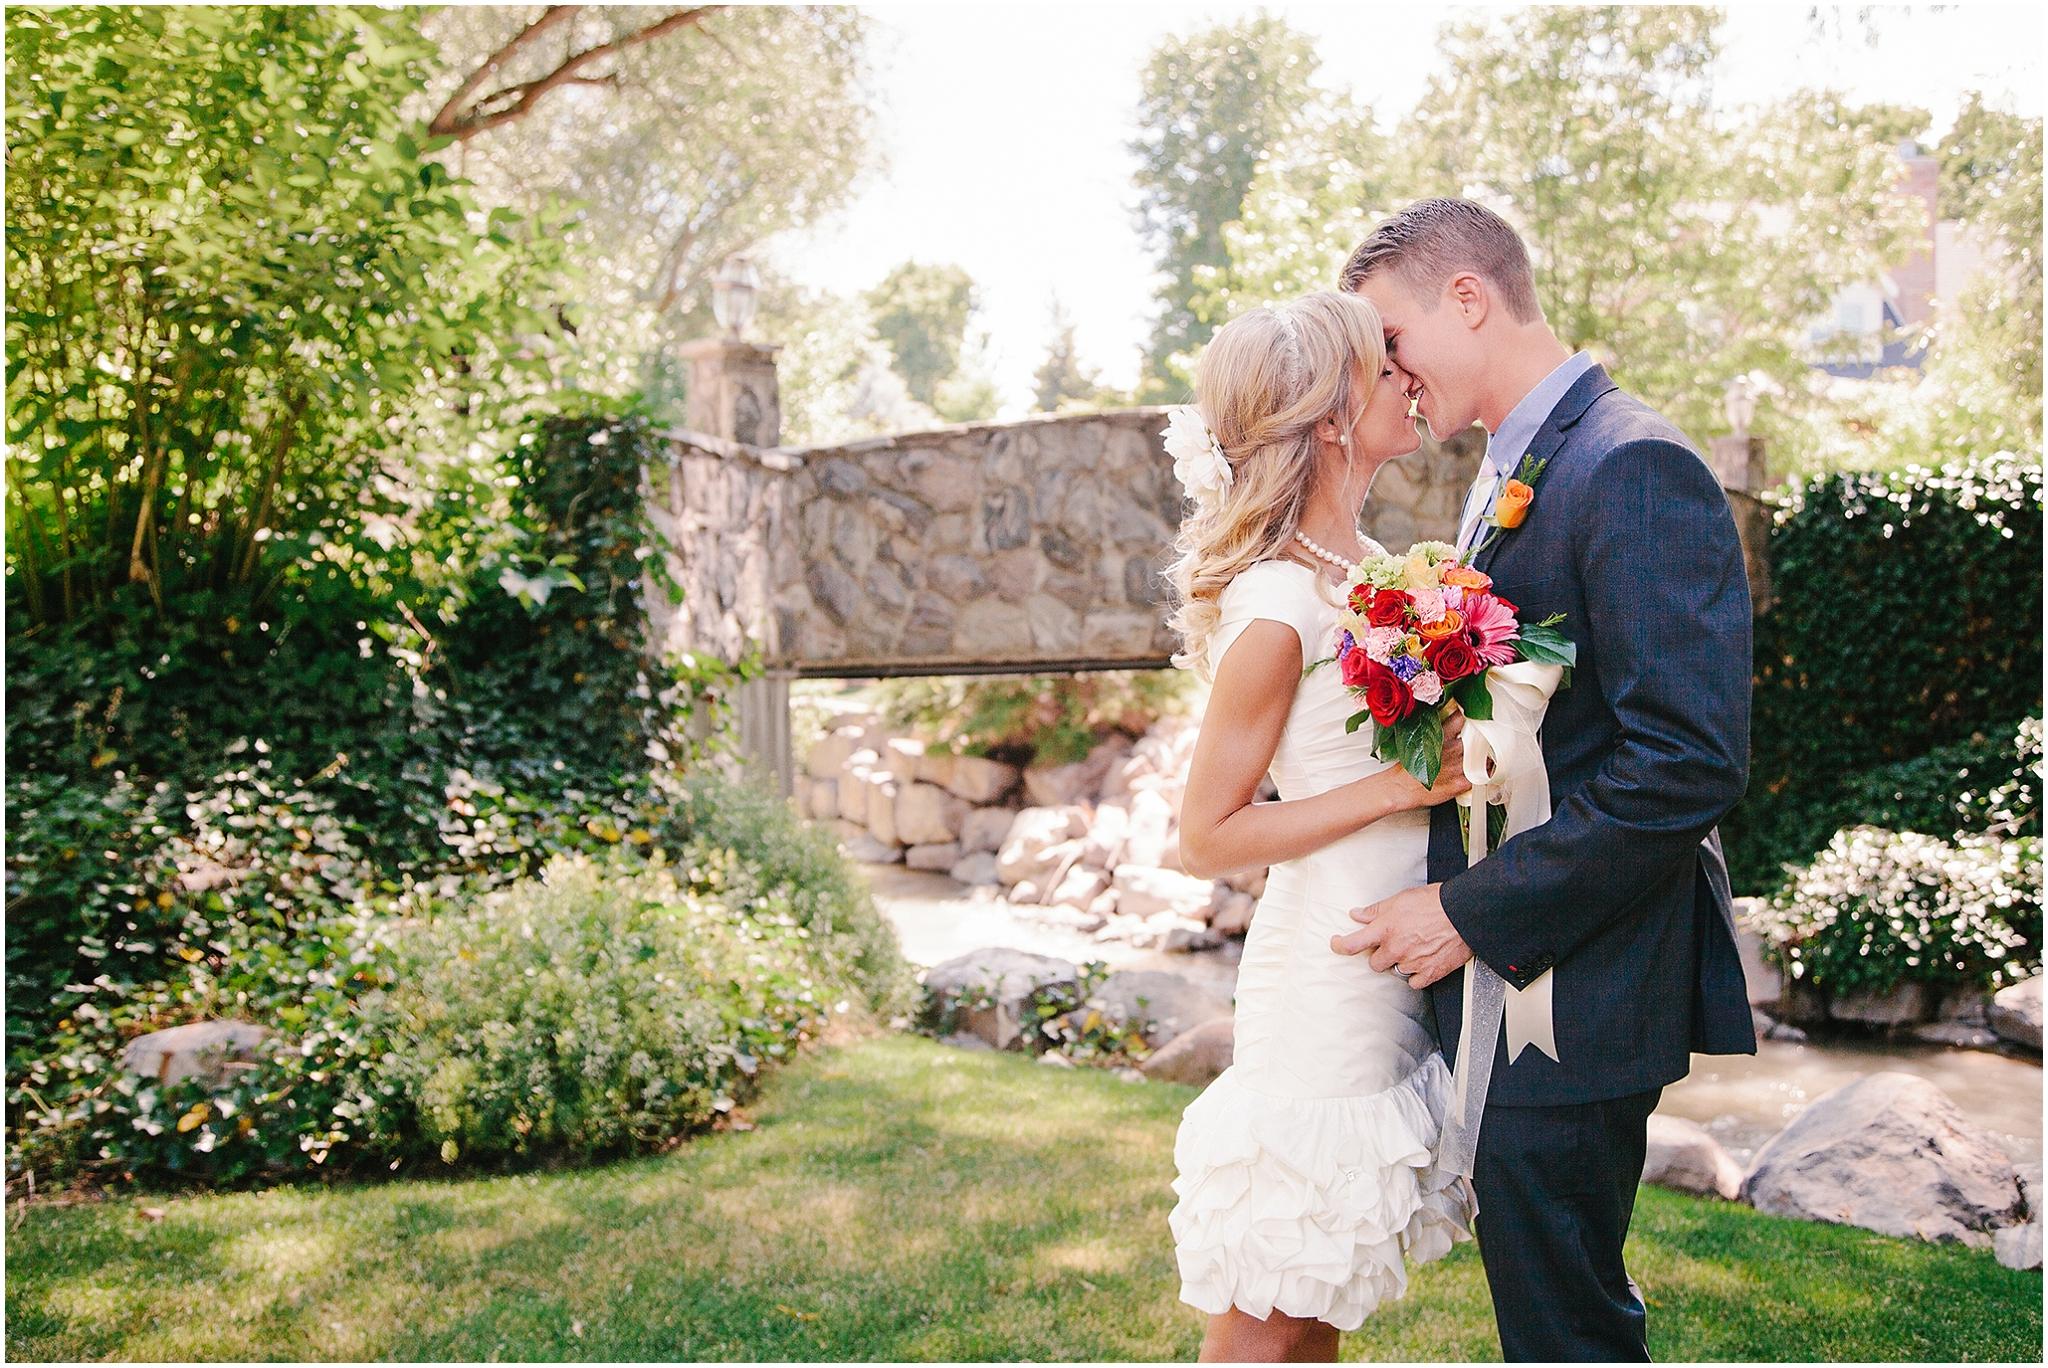 IMG_6529-Edit-Edit-74_Lizzie-B-Imagery-Utah-Wedding-Photographer-Salt-Lake-City-Park-City-timpanogos-Utah-Temple.jpg